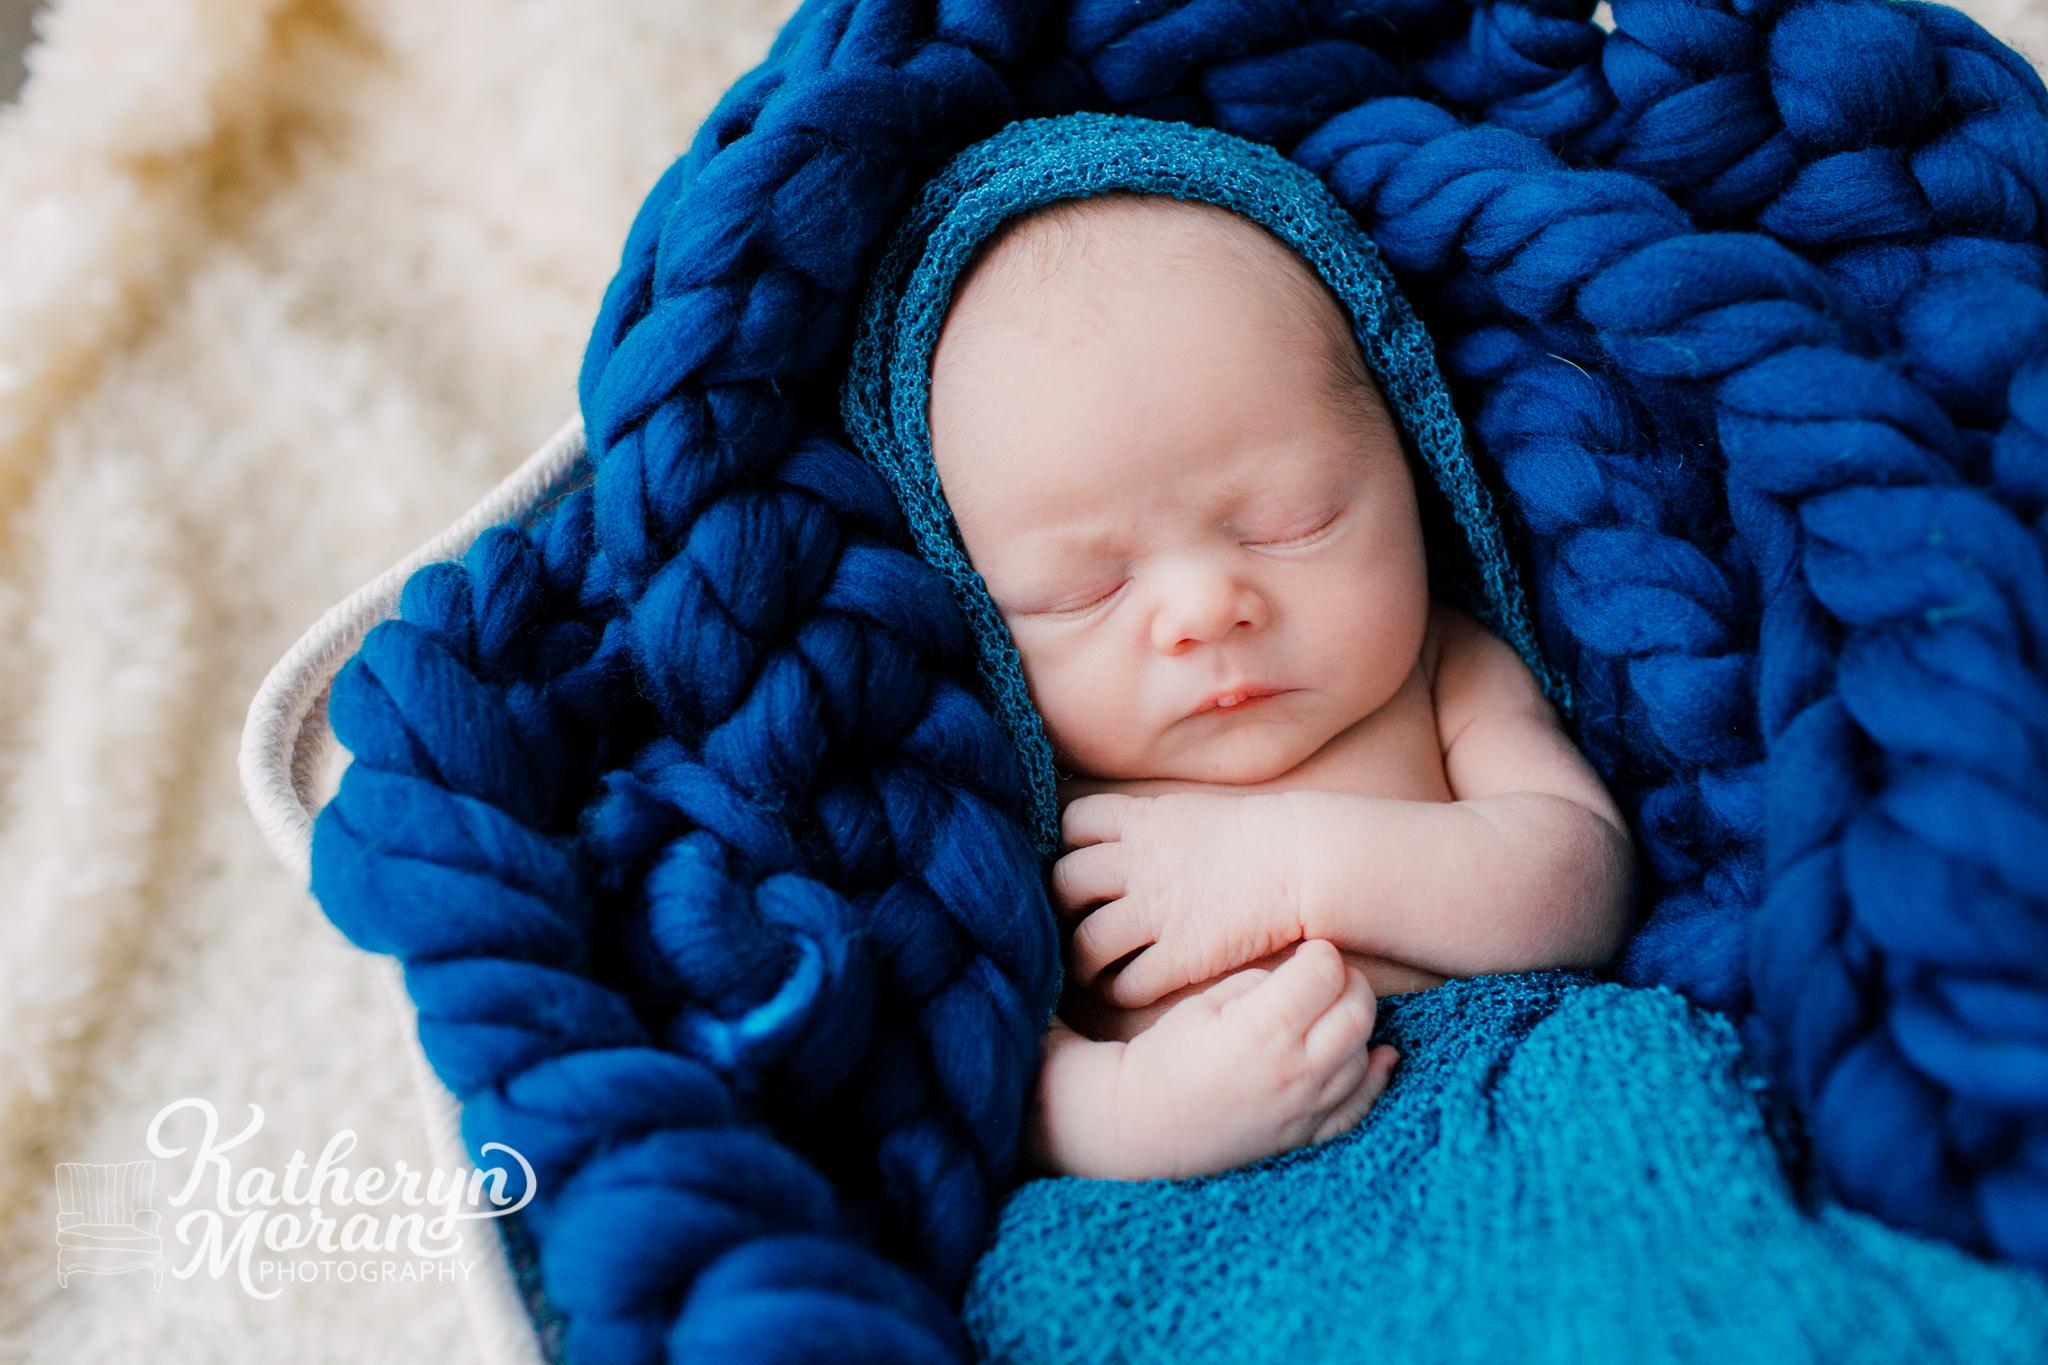 bellingham-newborn-lifestyle-photographer-katheryn-moran-harrison-hill-20.jpg